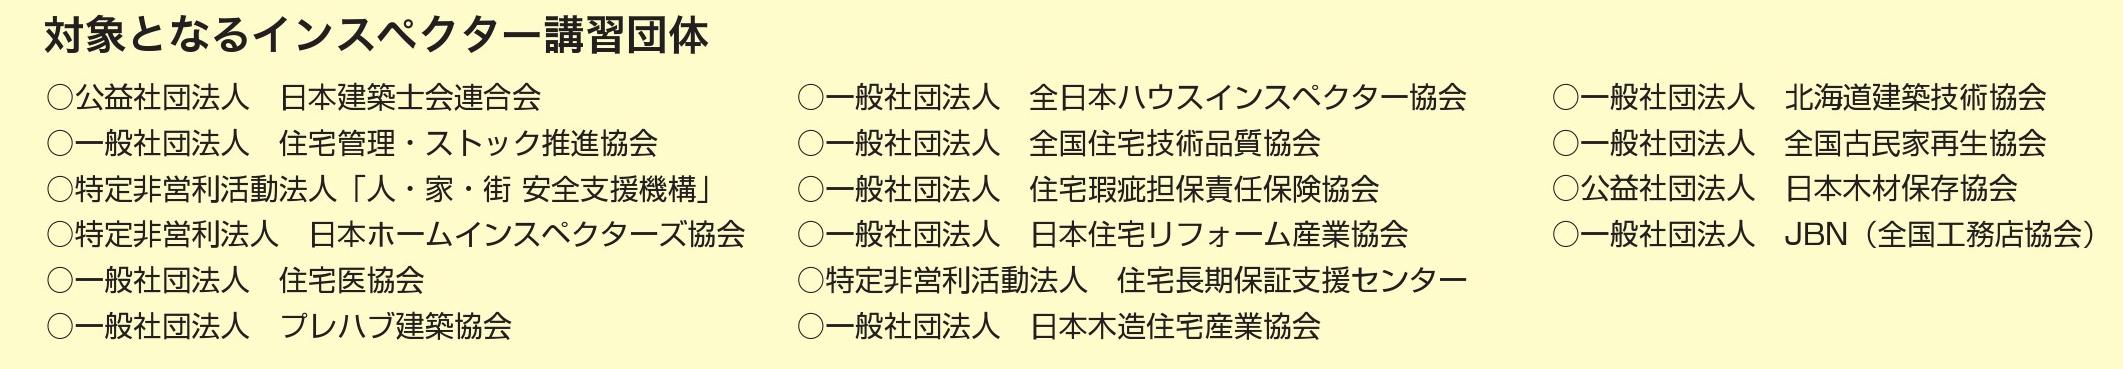 image_taisyou